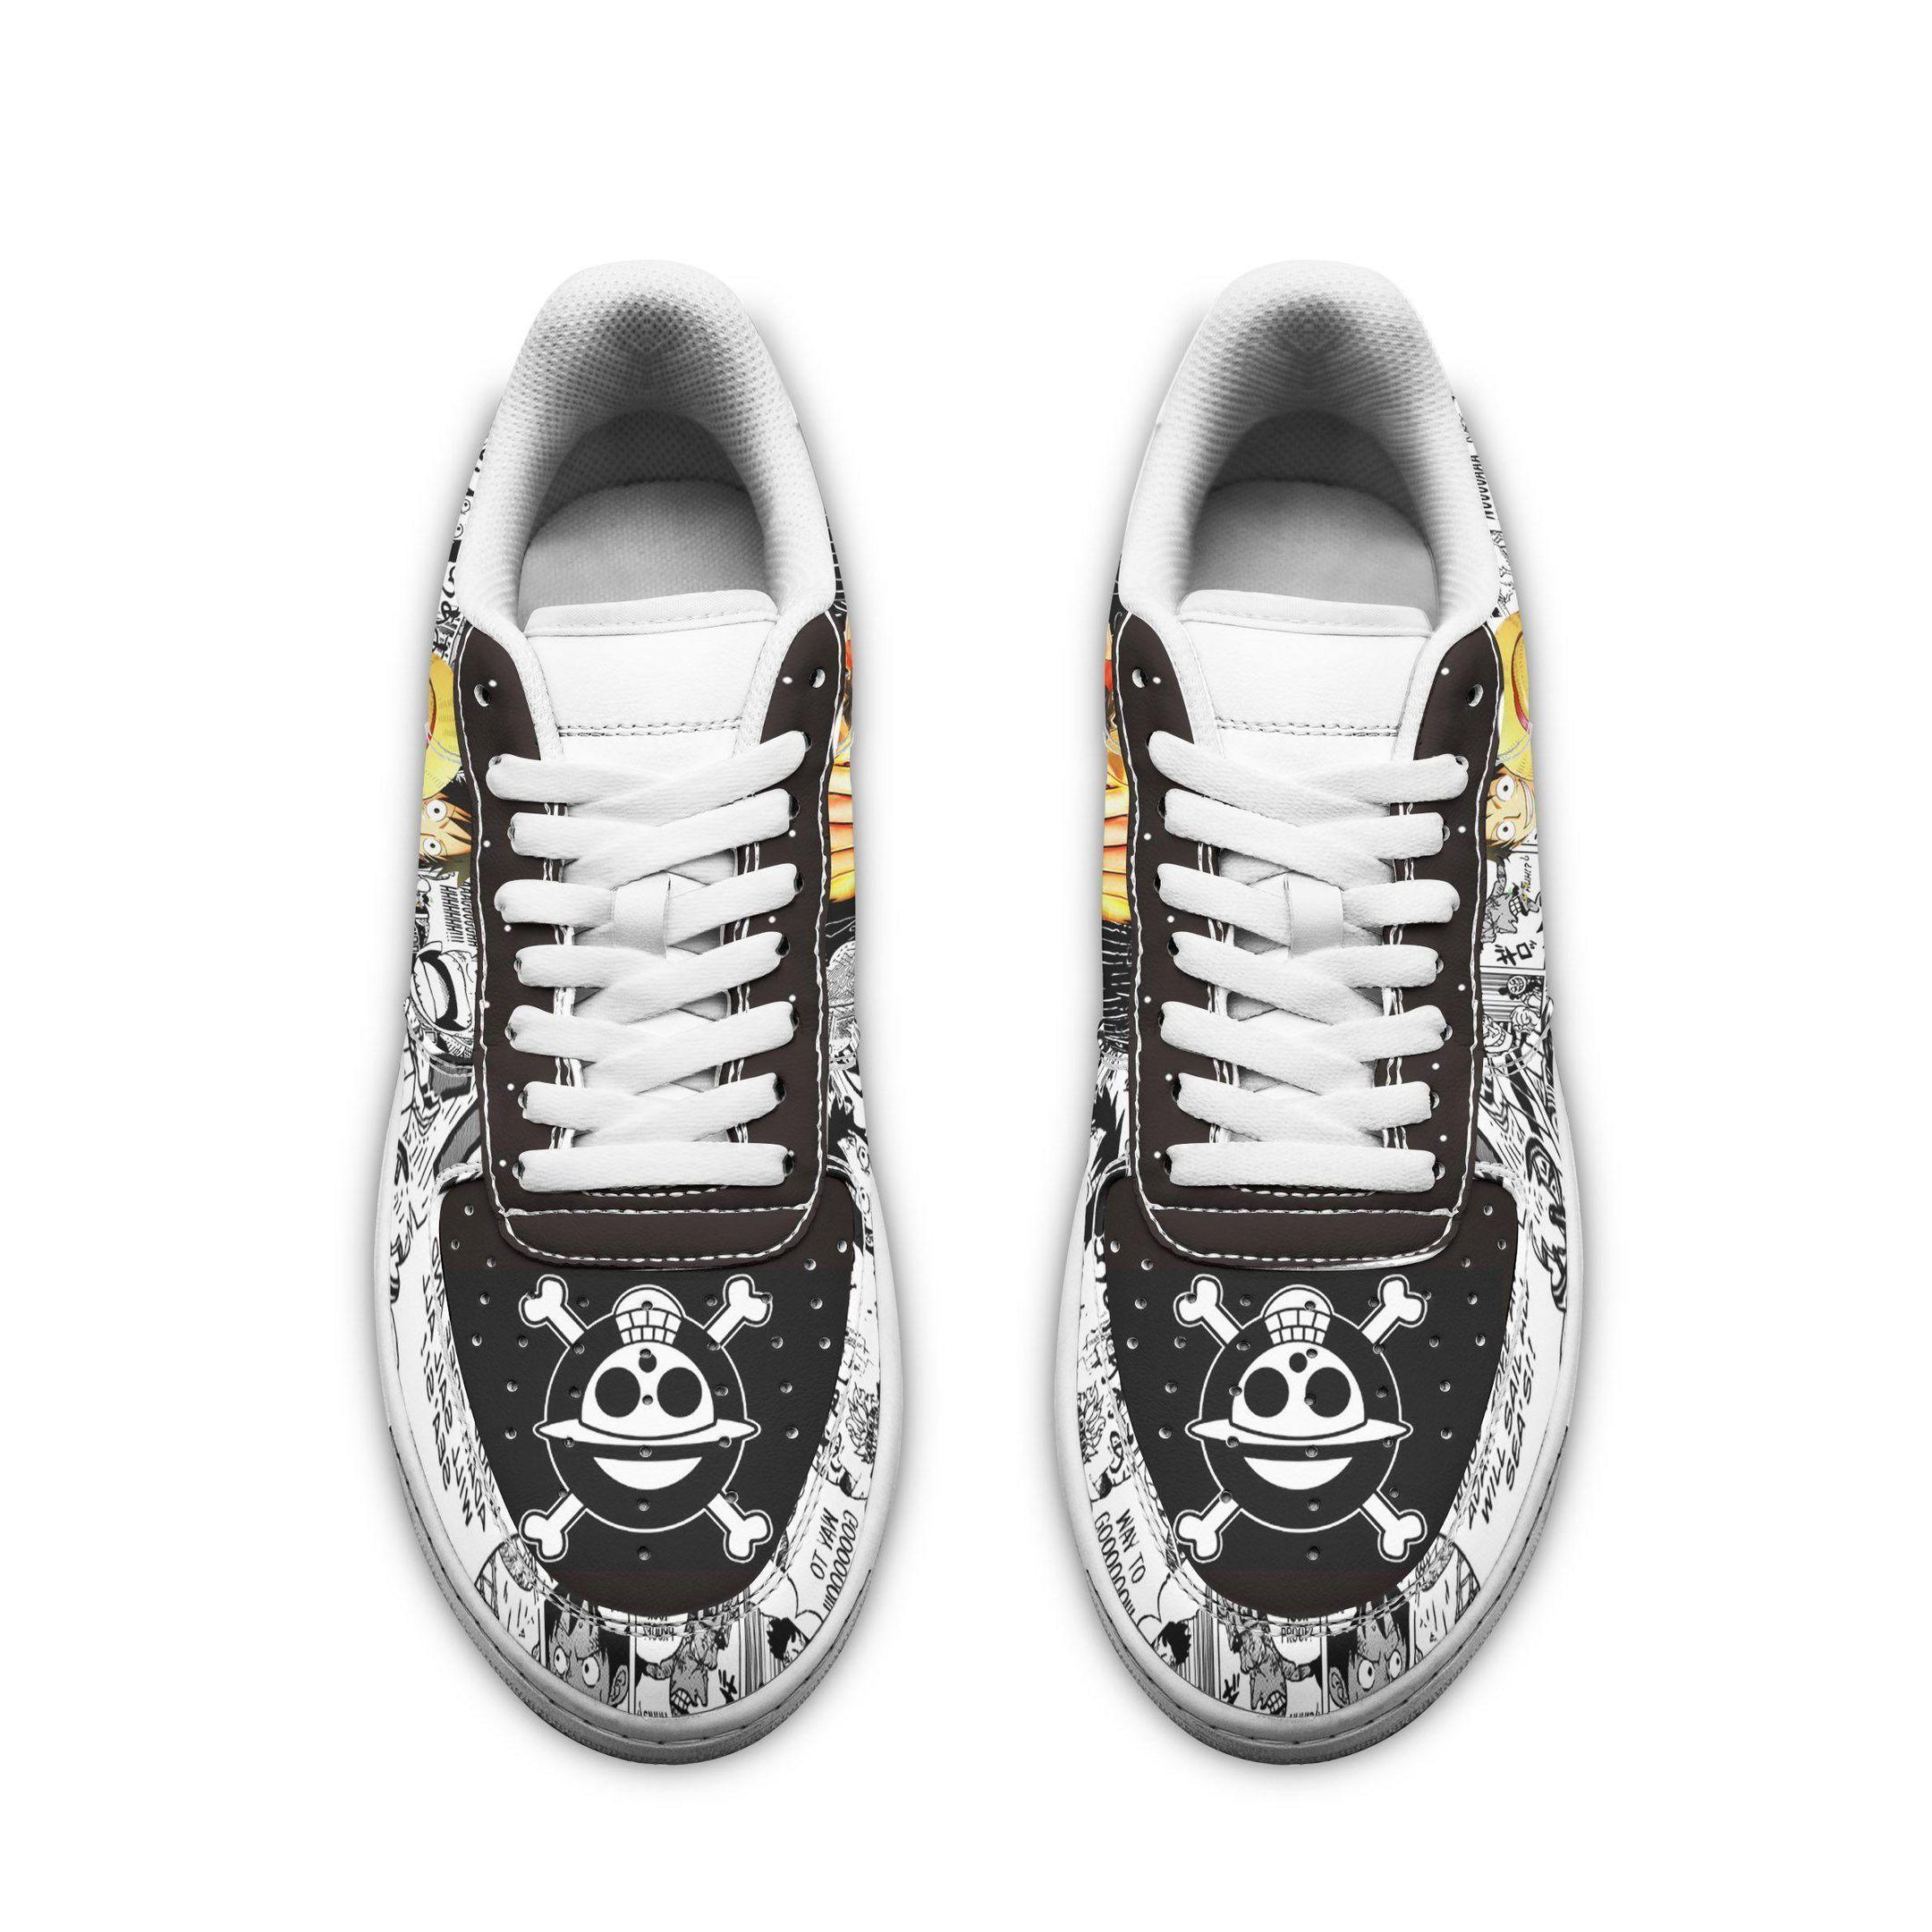 One Piece Air Shoes Manga Anime Shoes Fan Gift Idea GO1012